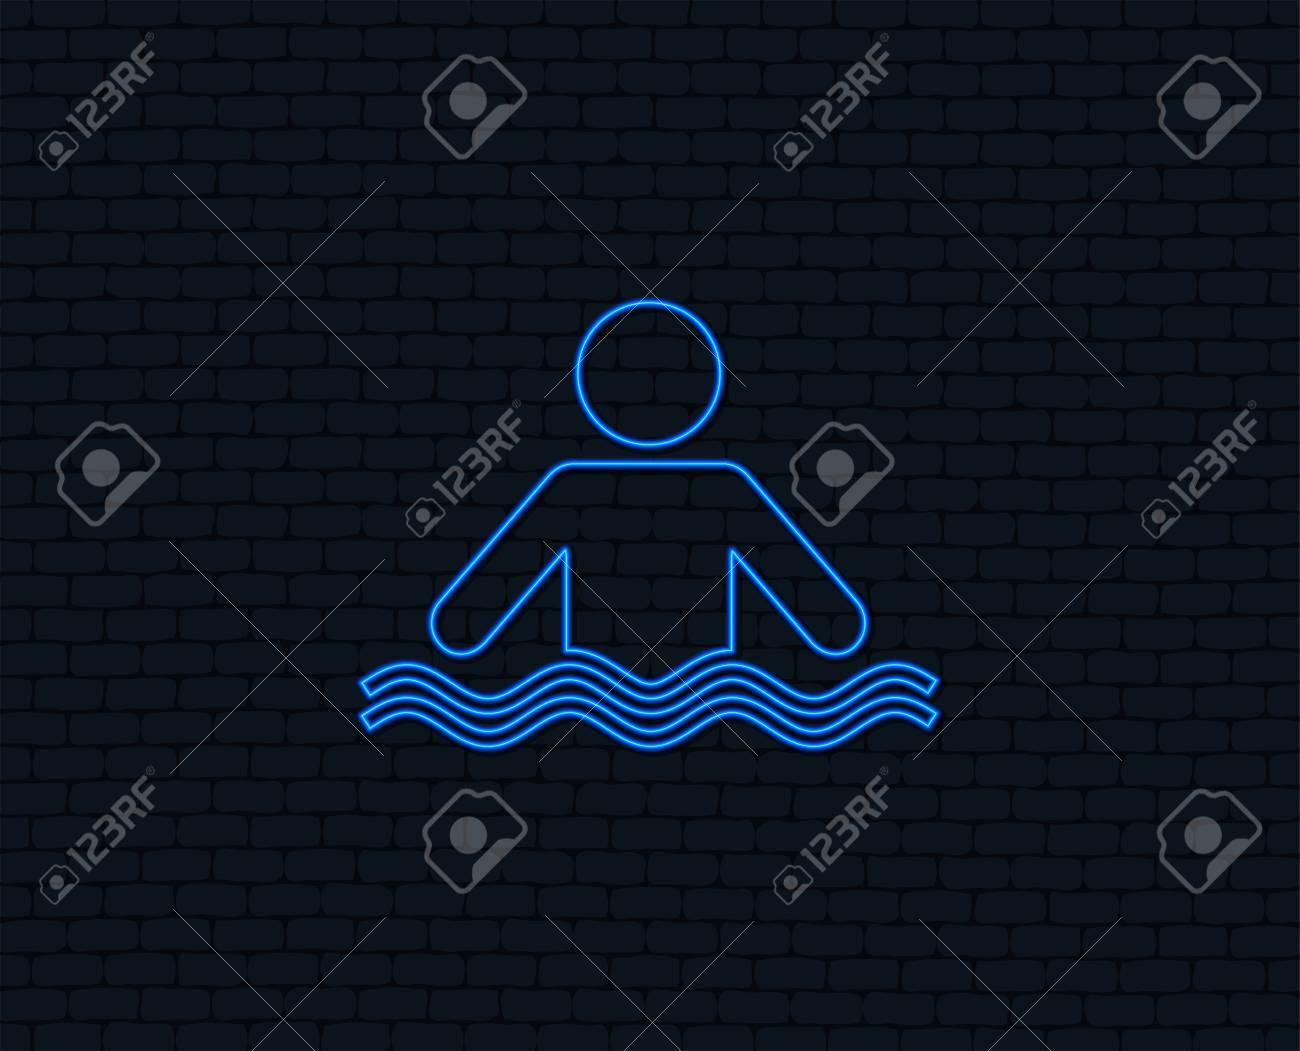 Neon light  Swimming sign icon  Pool swim symbol  Sea wave  Glowing